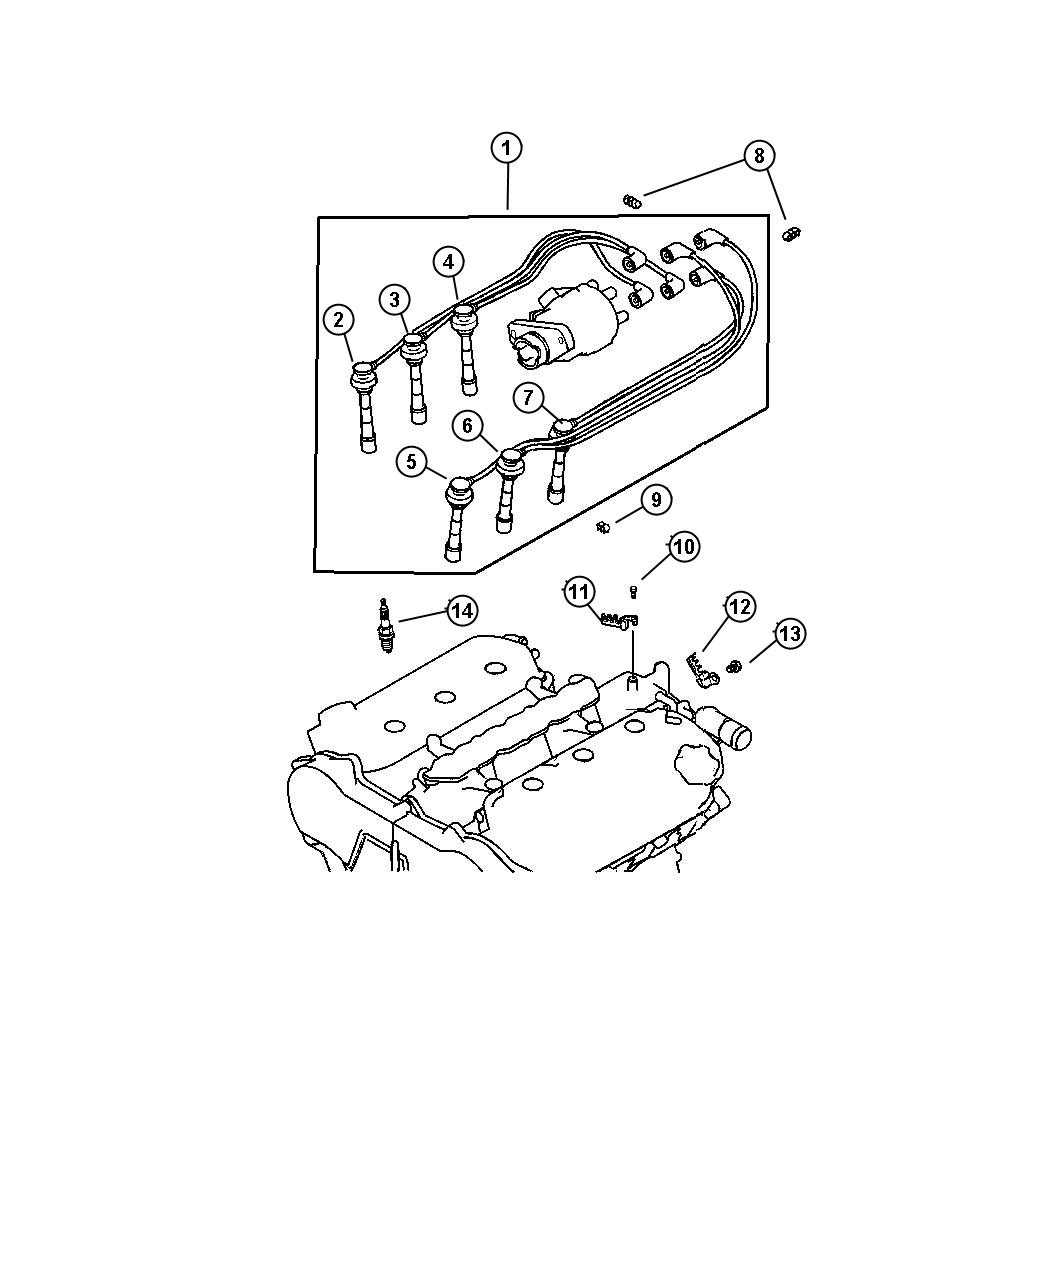 Dodge Stratus Spark Plug Maintenance Electrical